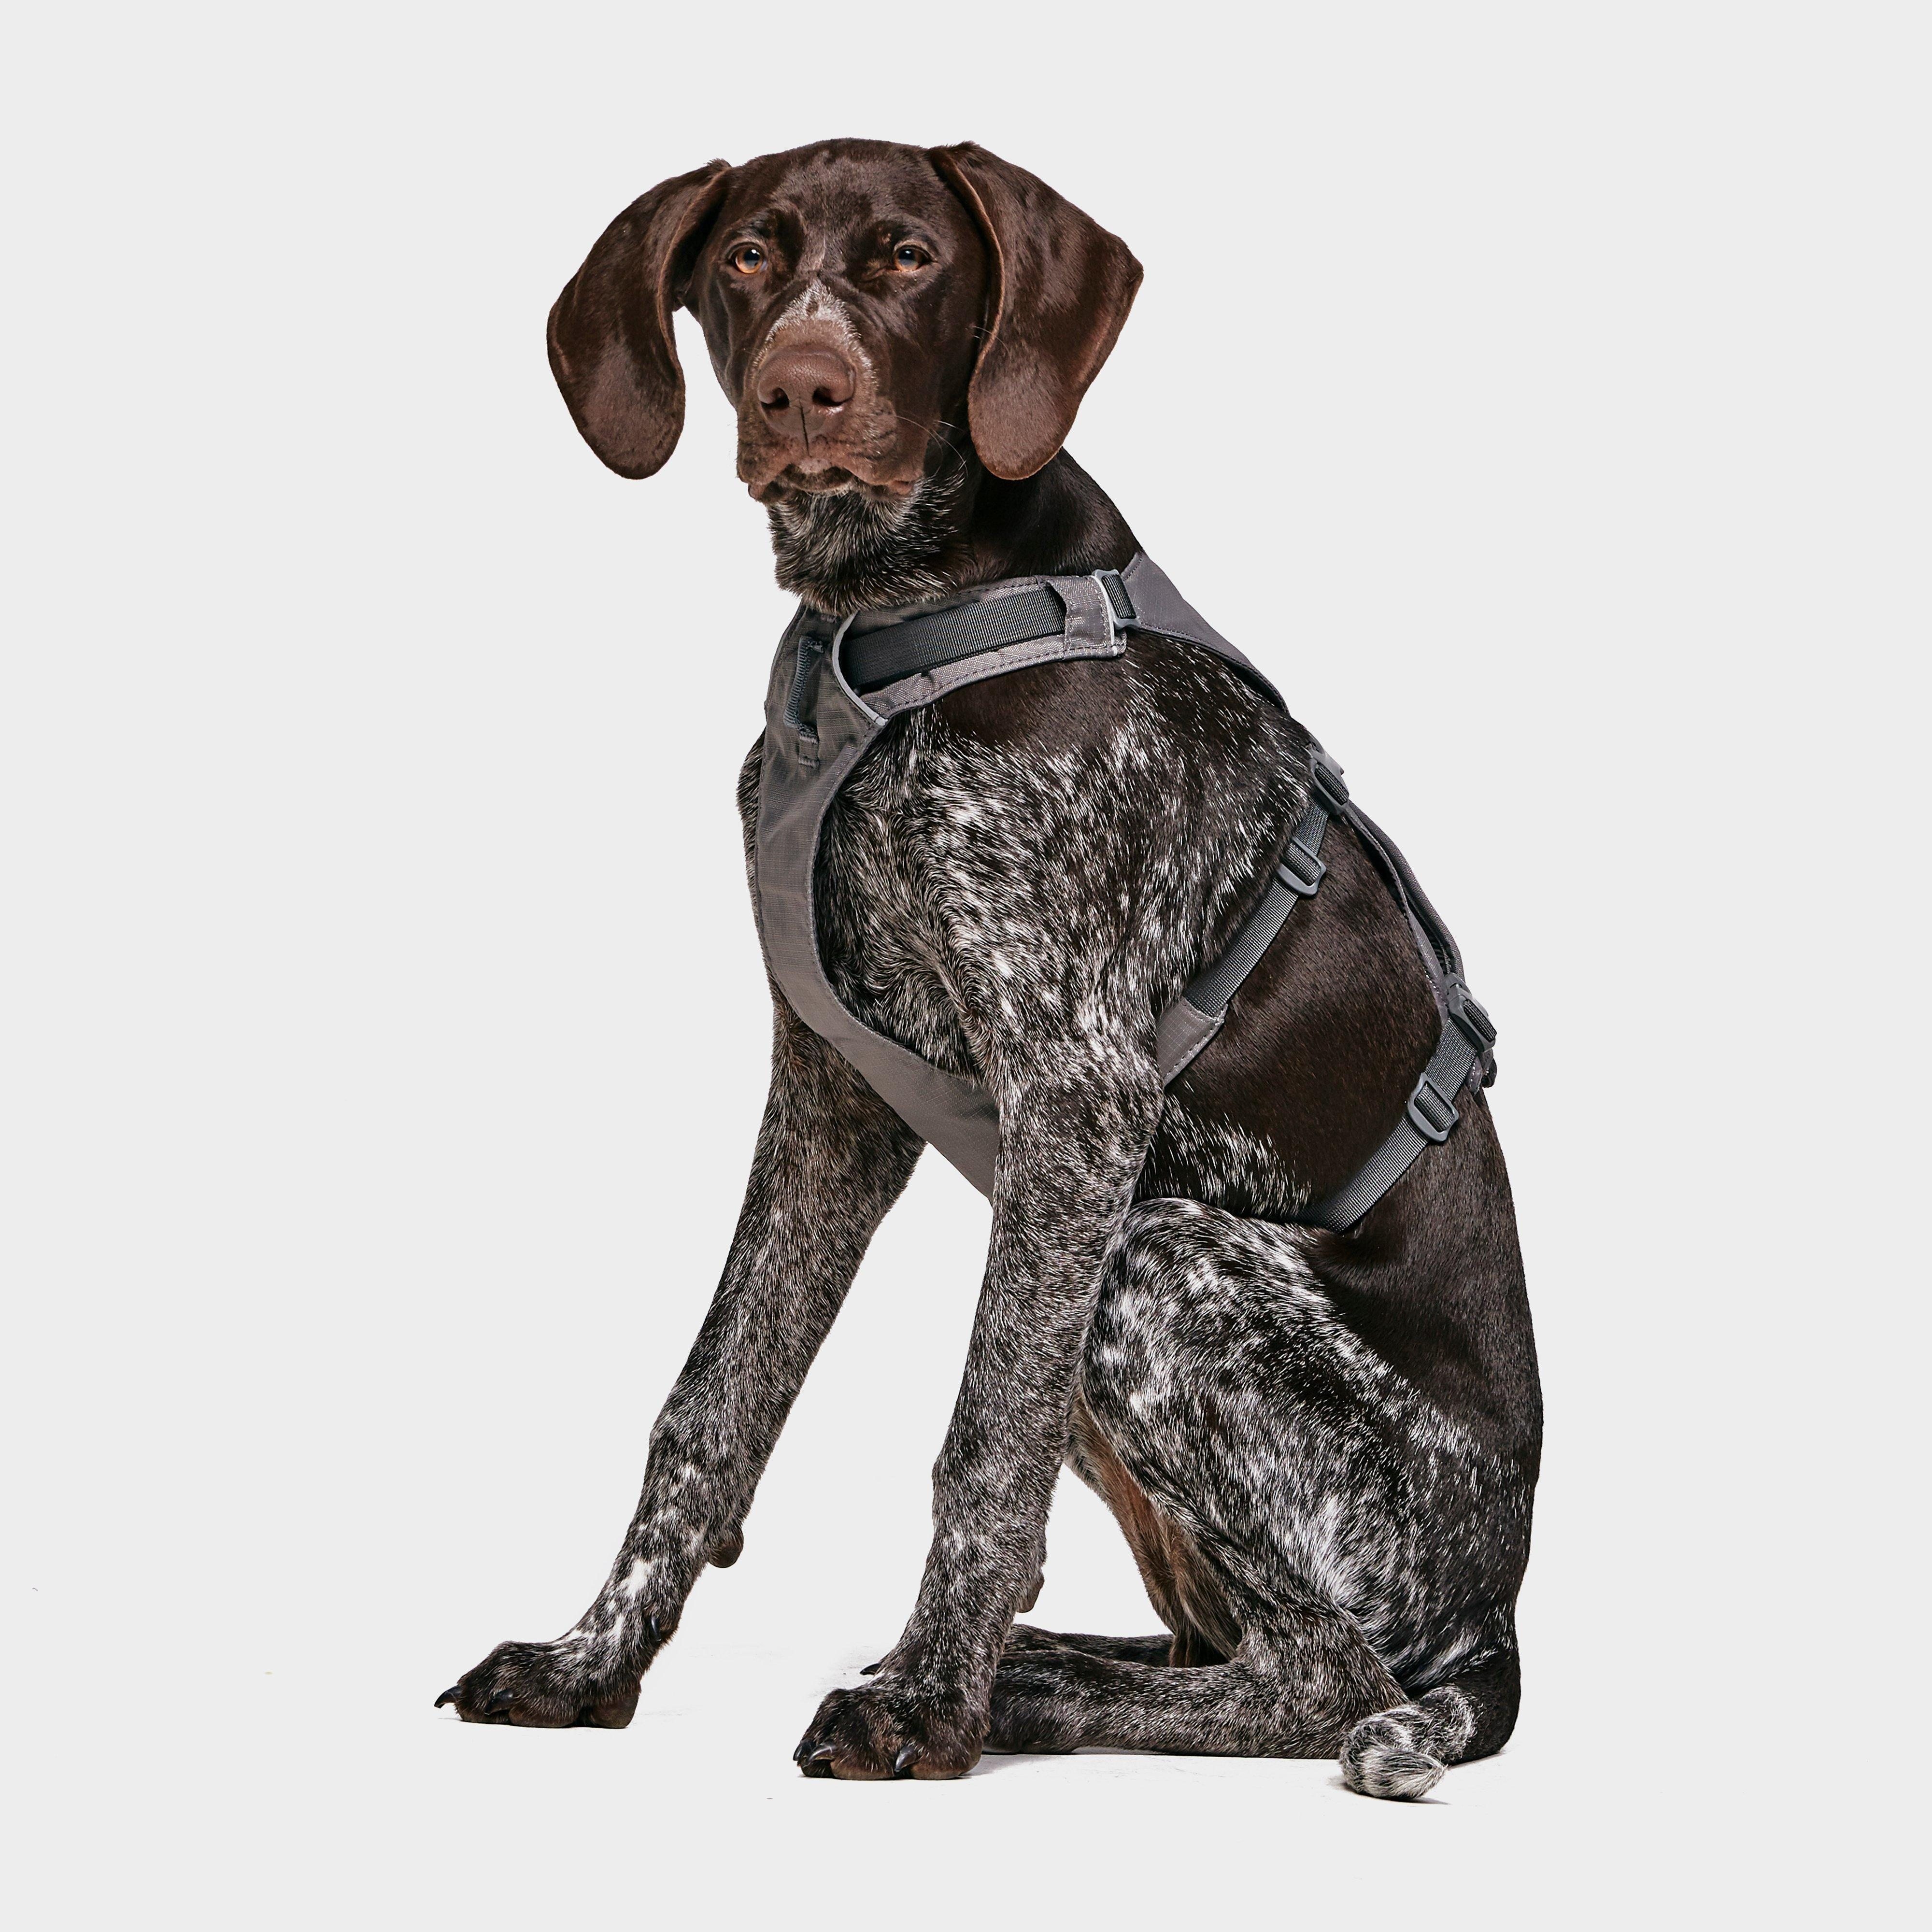 Image of Ruffwear Flagline Dog Harness - Grey/Dgy, Grey/DGY